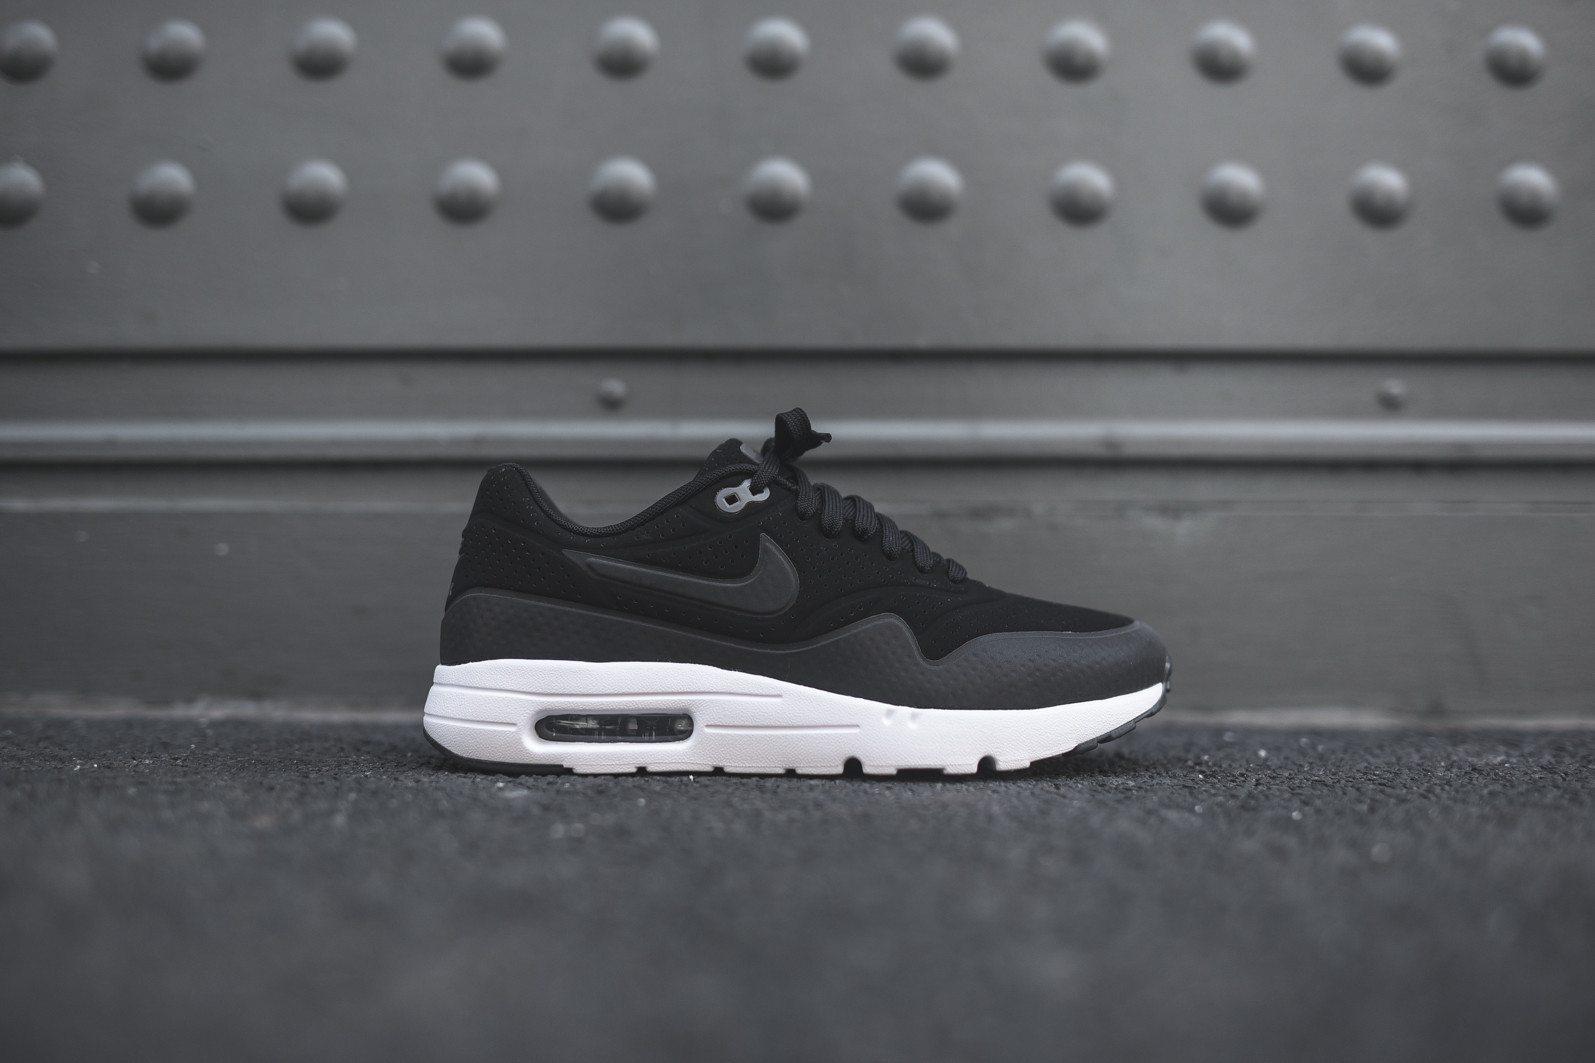 Nike Air Max 1 Ultra Moire Black Dark Grey White 2